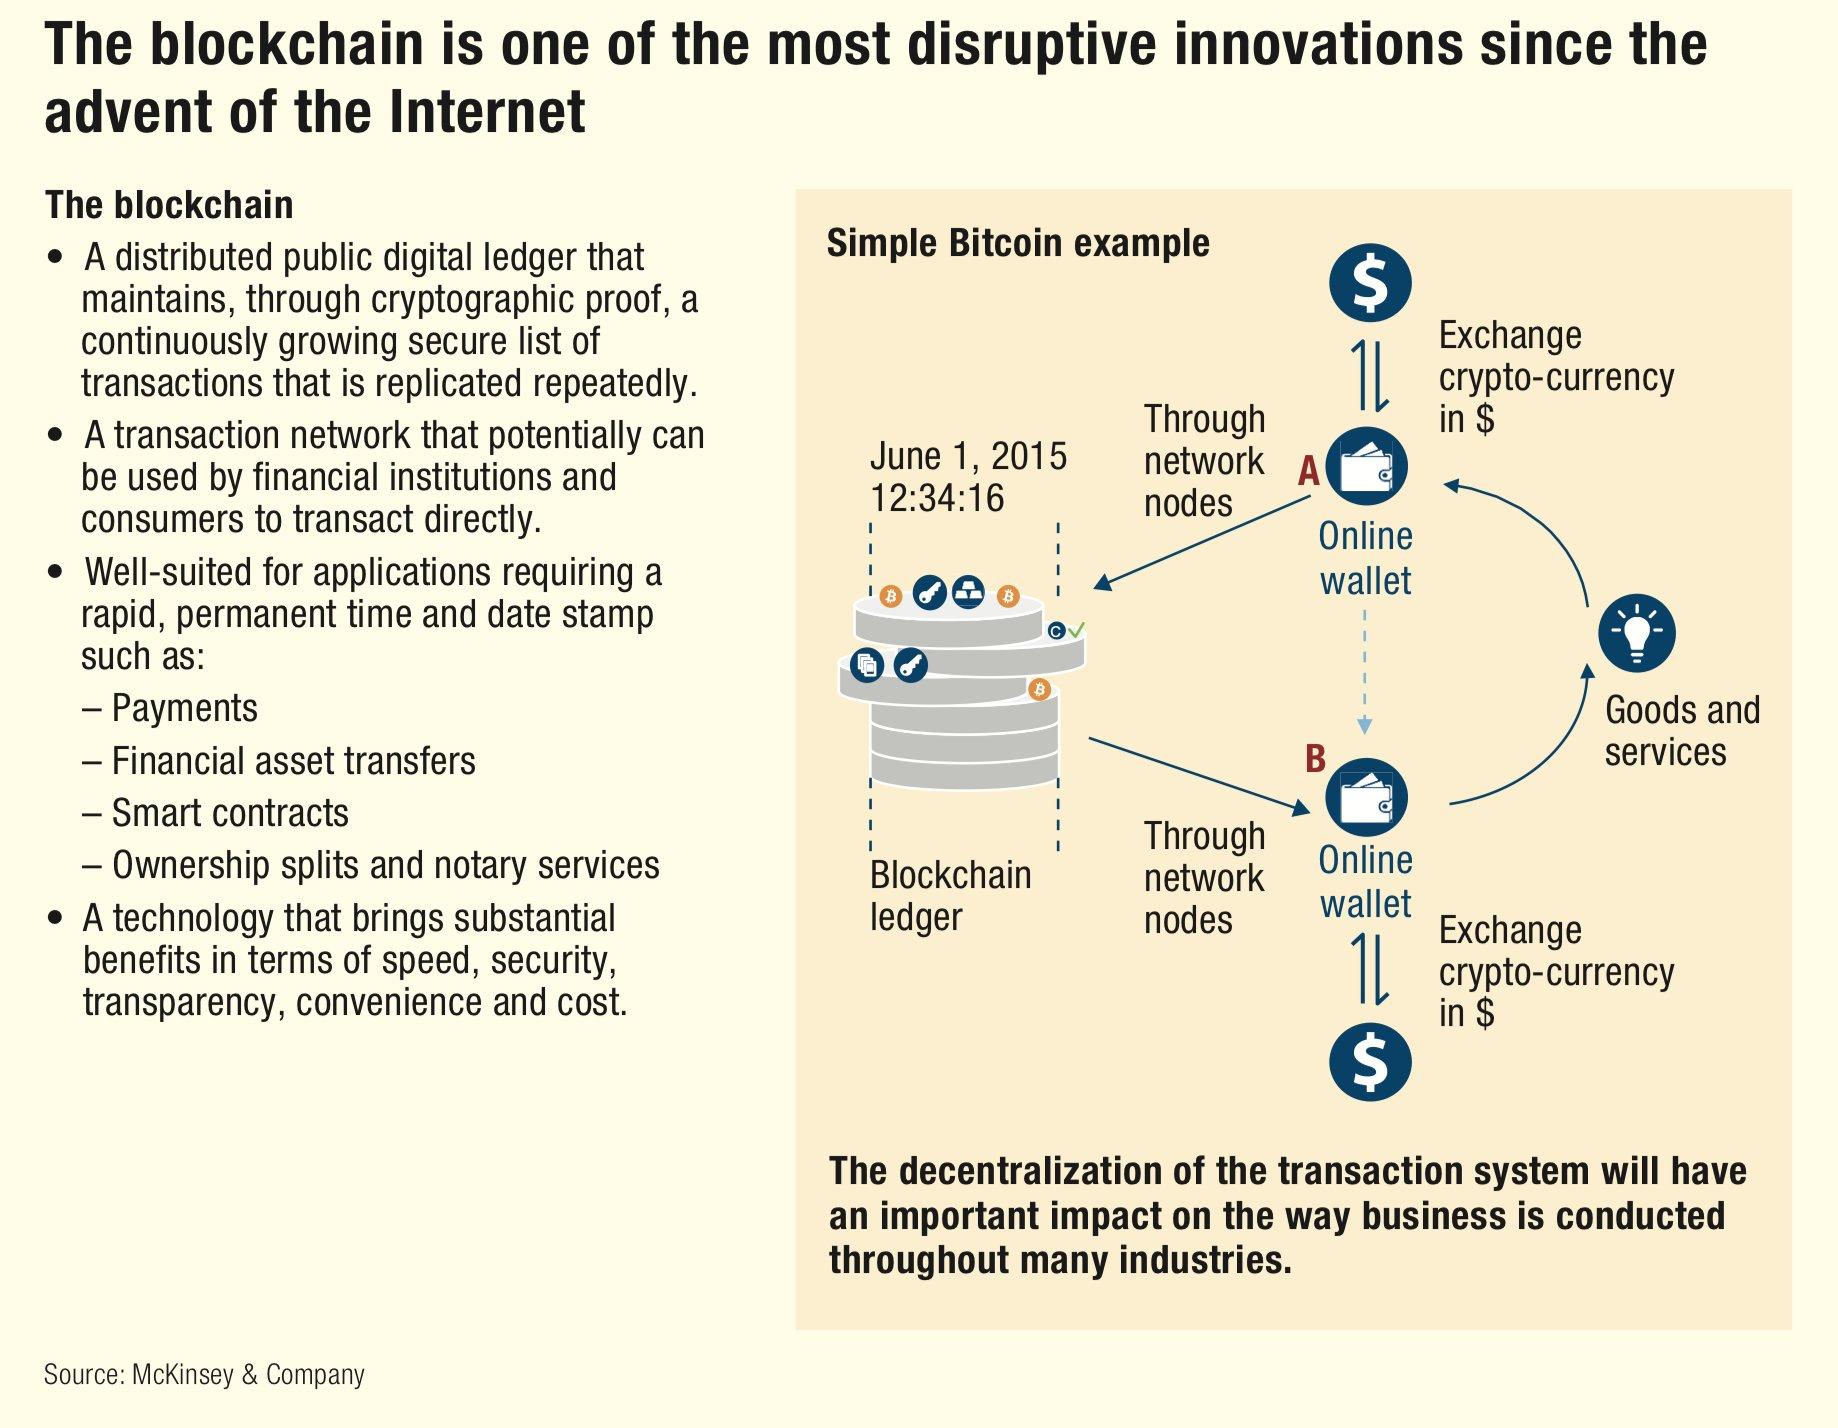 Blockchain explained - bitcoin example